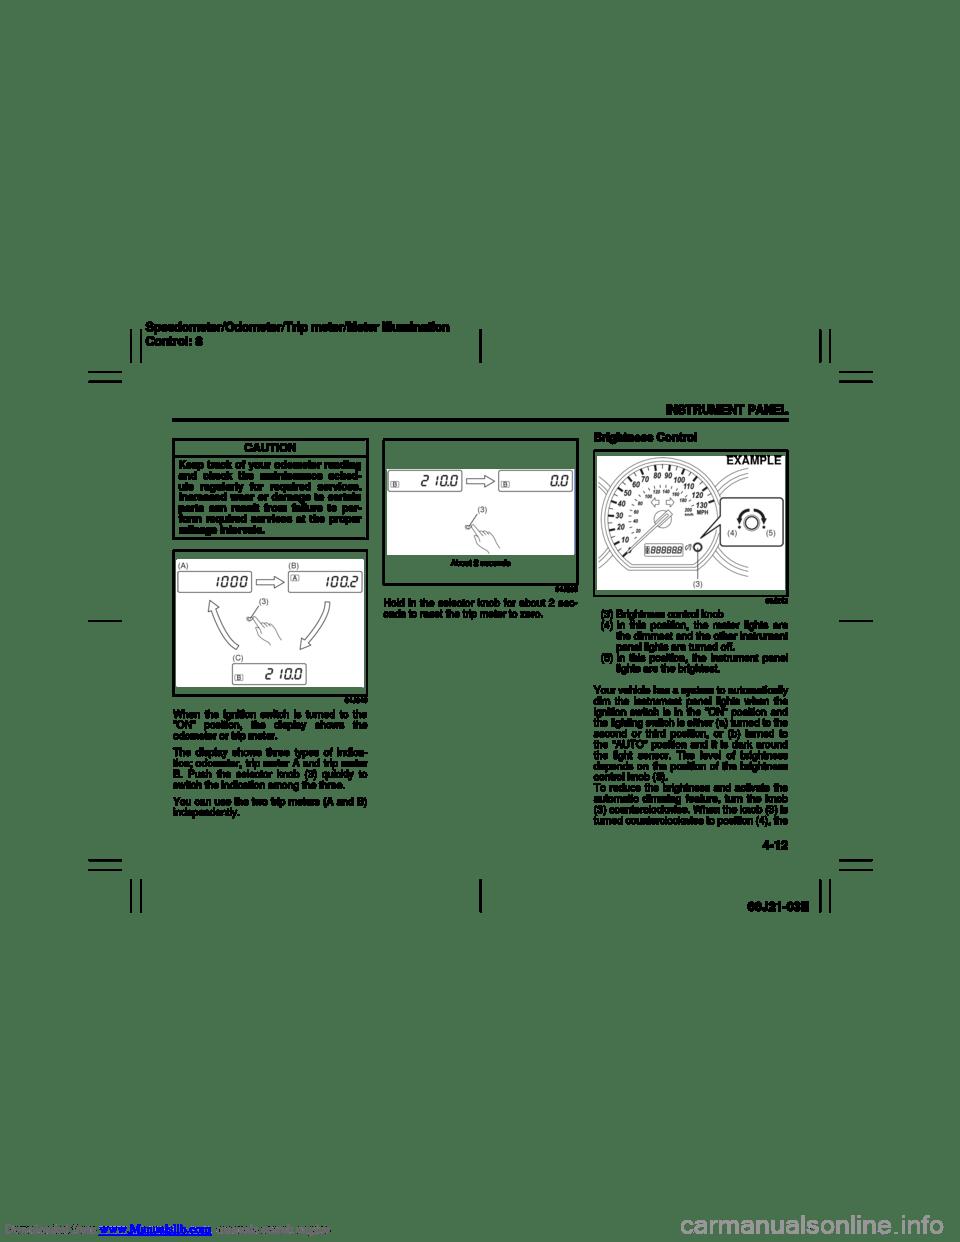 SUZUKI GRAND VITARA 2007 3.G Manual PDF (211 Pages)